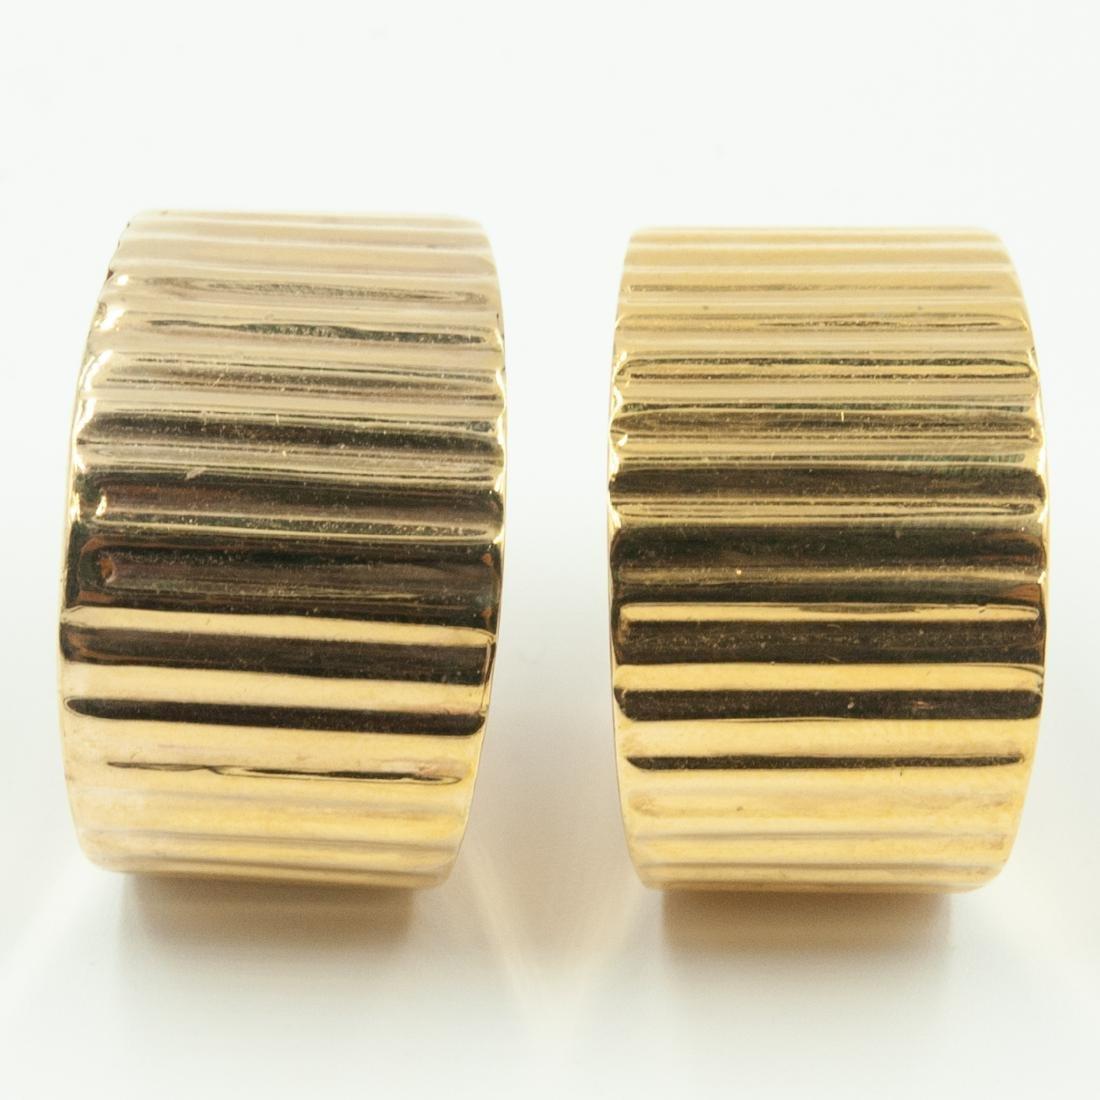 Gold & Diamond Jewelry Set - 9